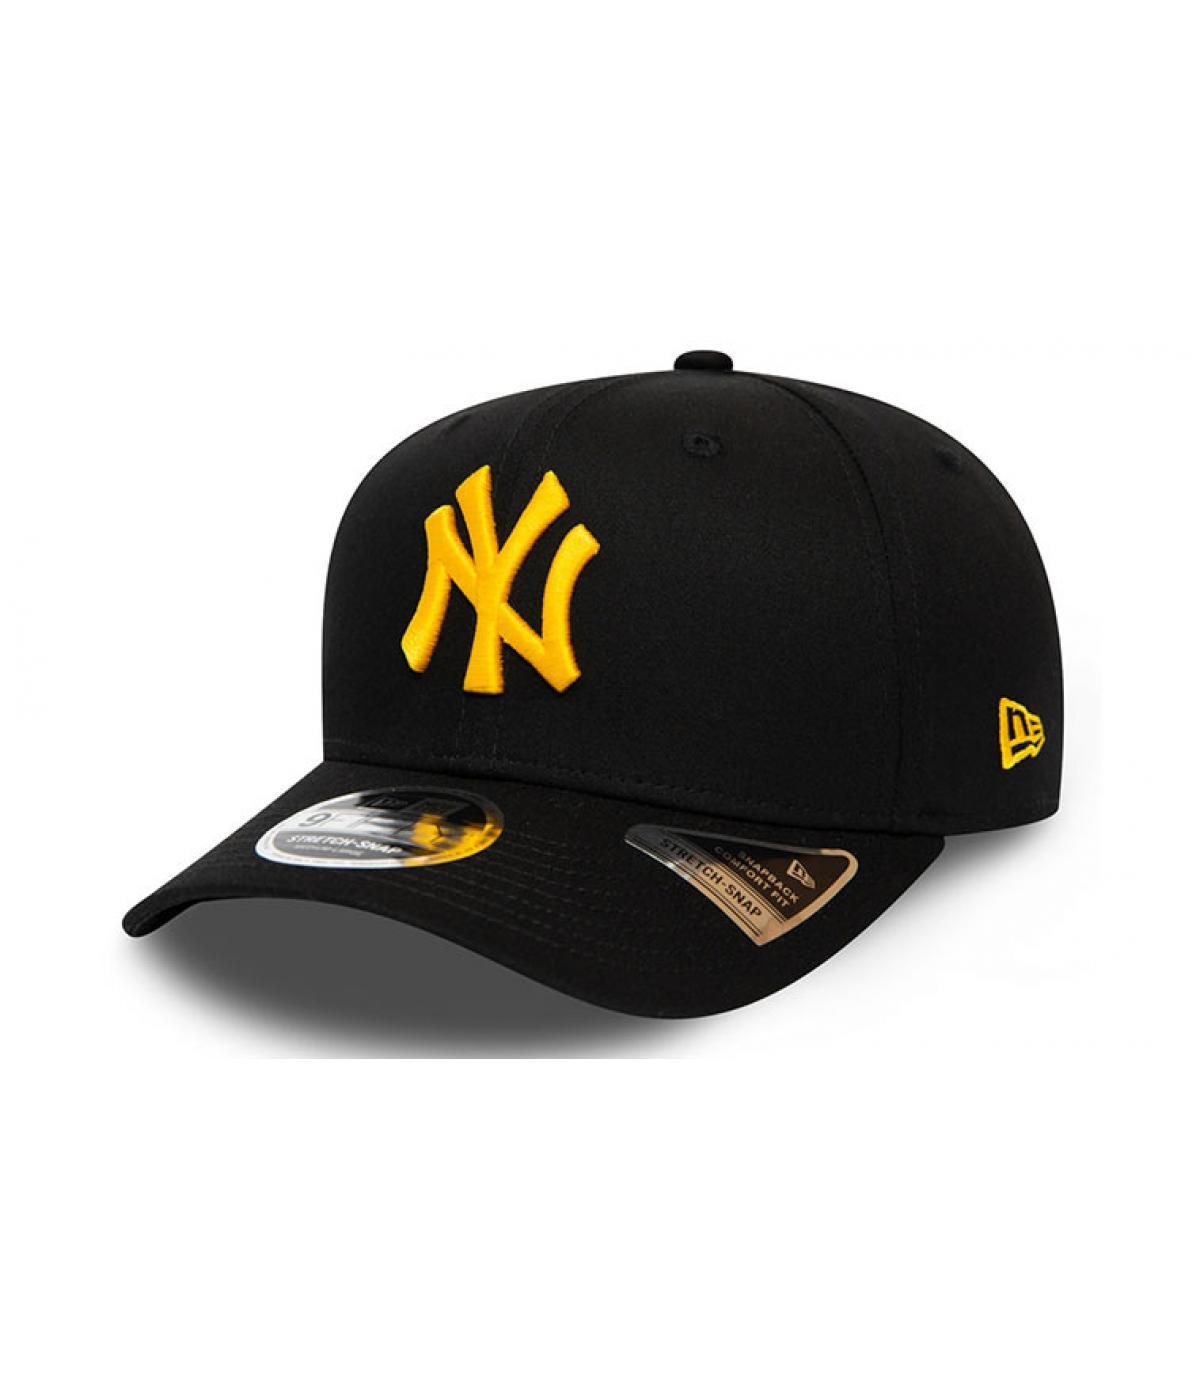 Details League Ess 950 Stretch NY black mellow yellow - Abbildung 2